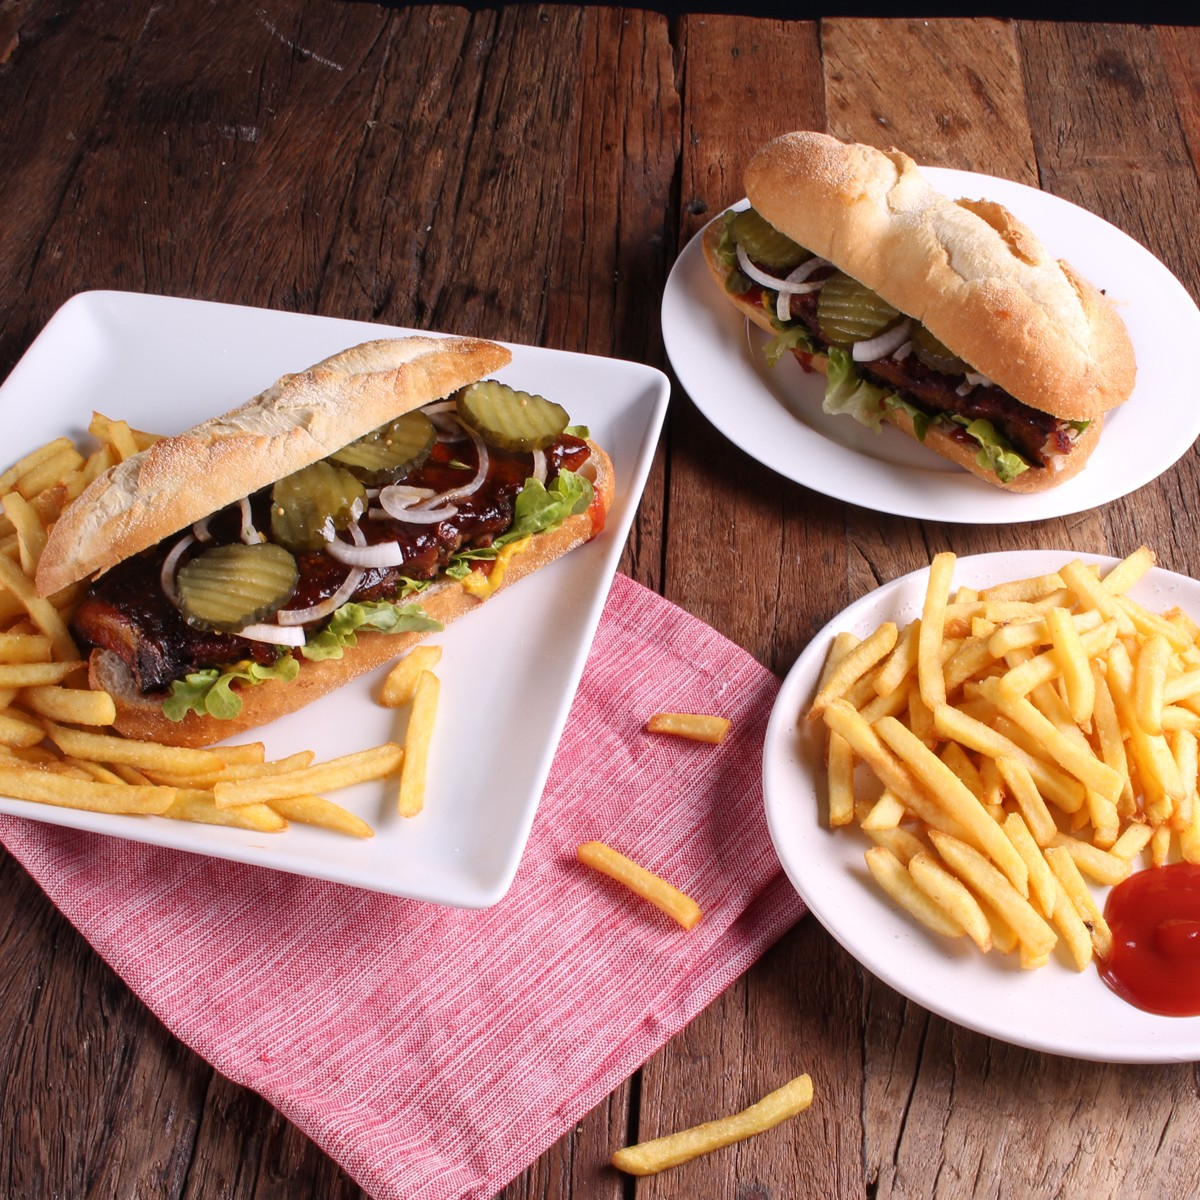 Homemade Boneless BBQ Pork Rib Sandwich - SunPork Pork Loin Ribs